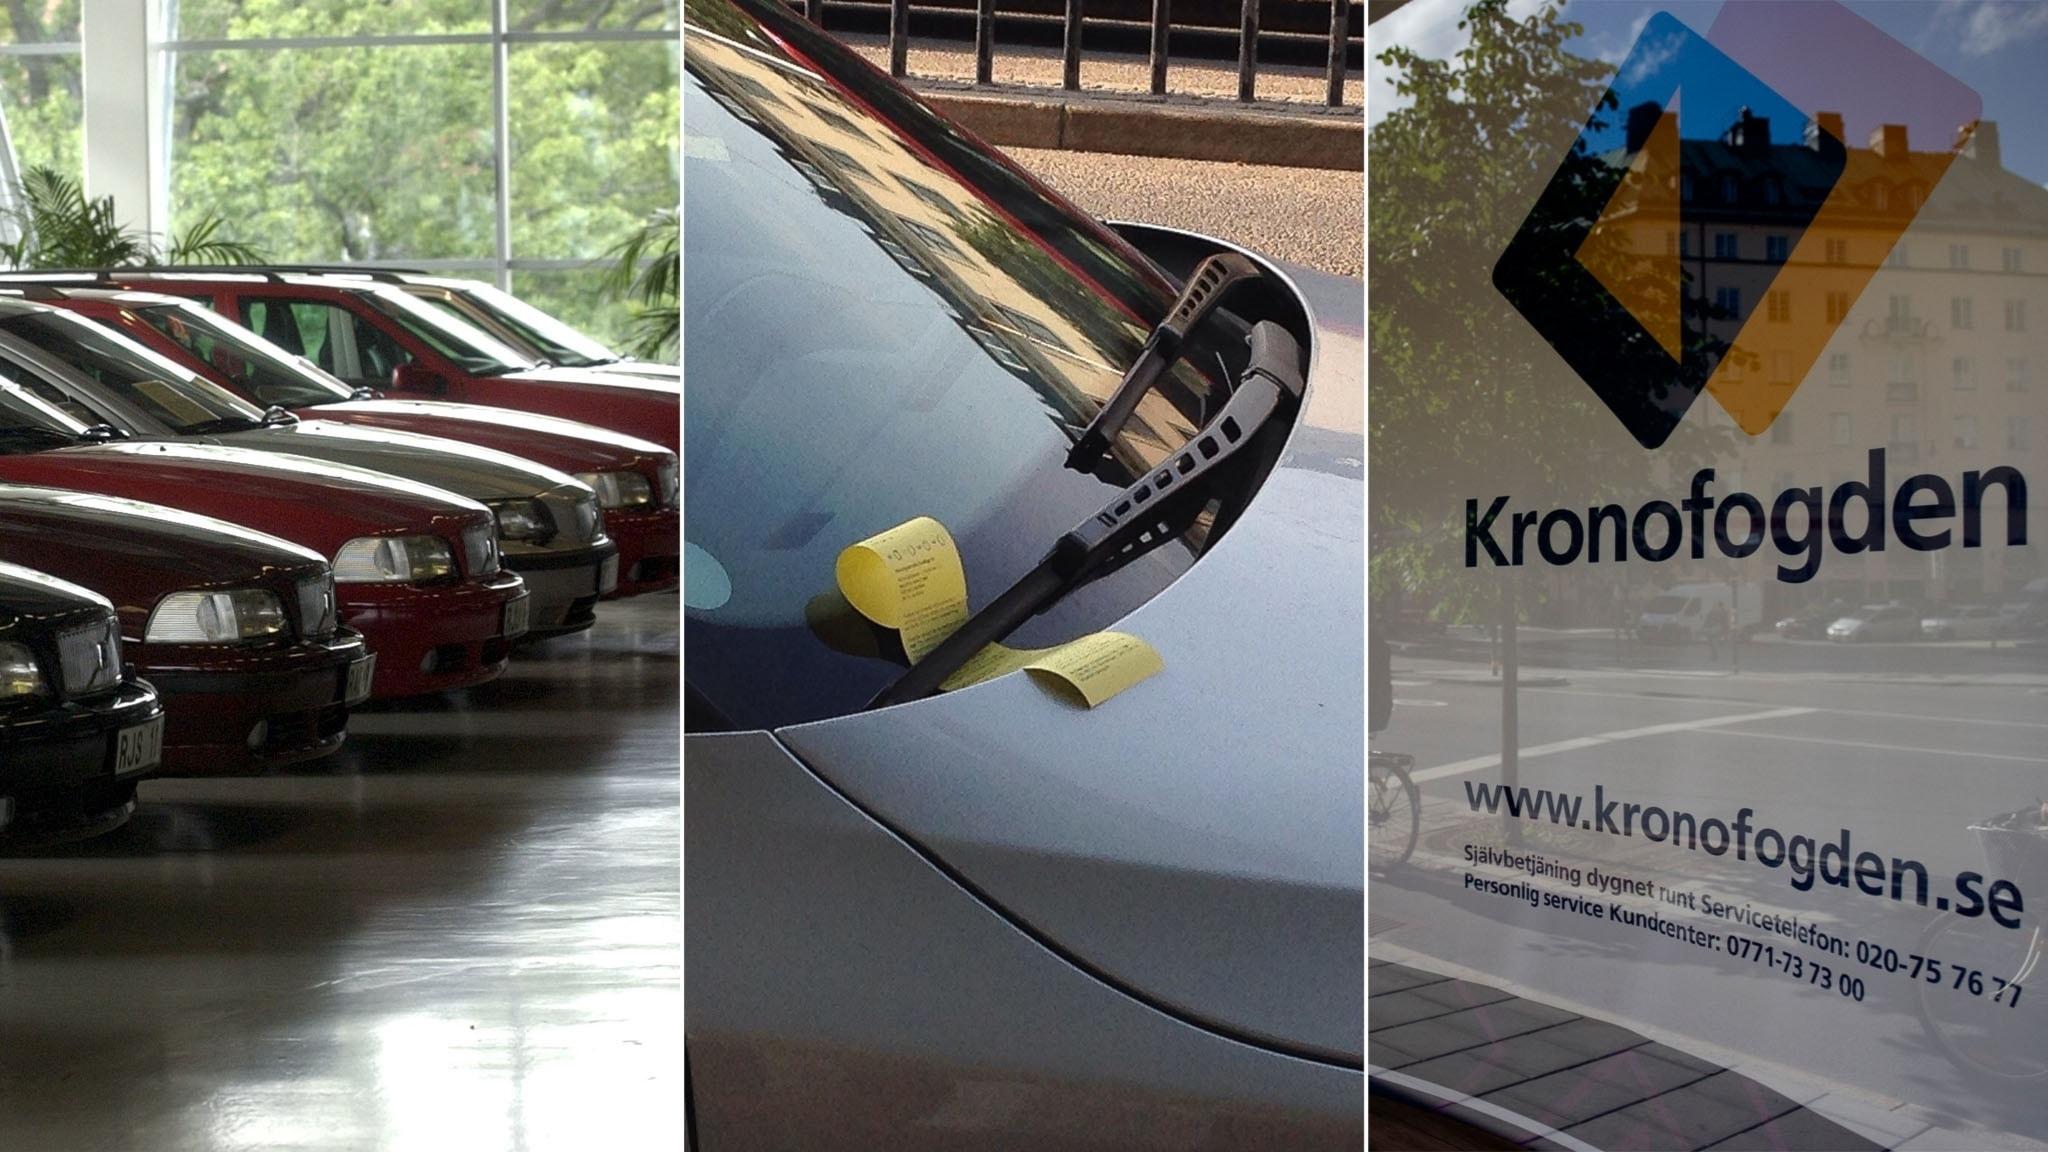 Barn ska inte belastas for bilskulder